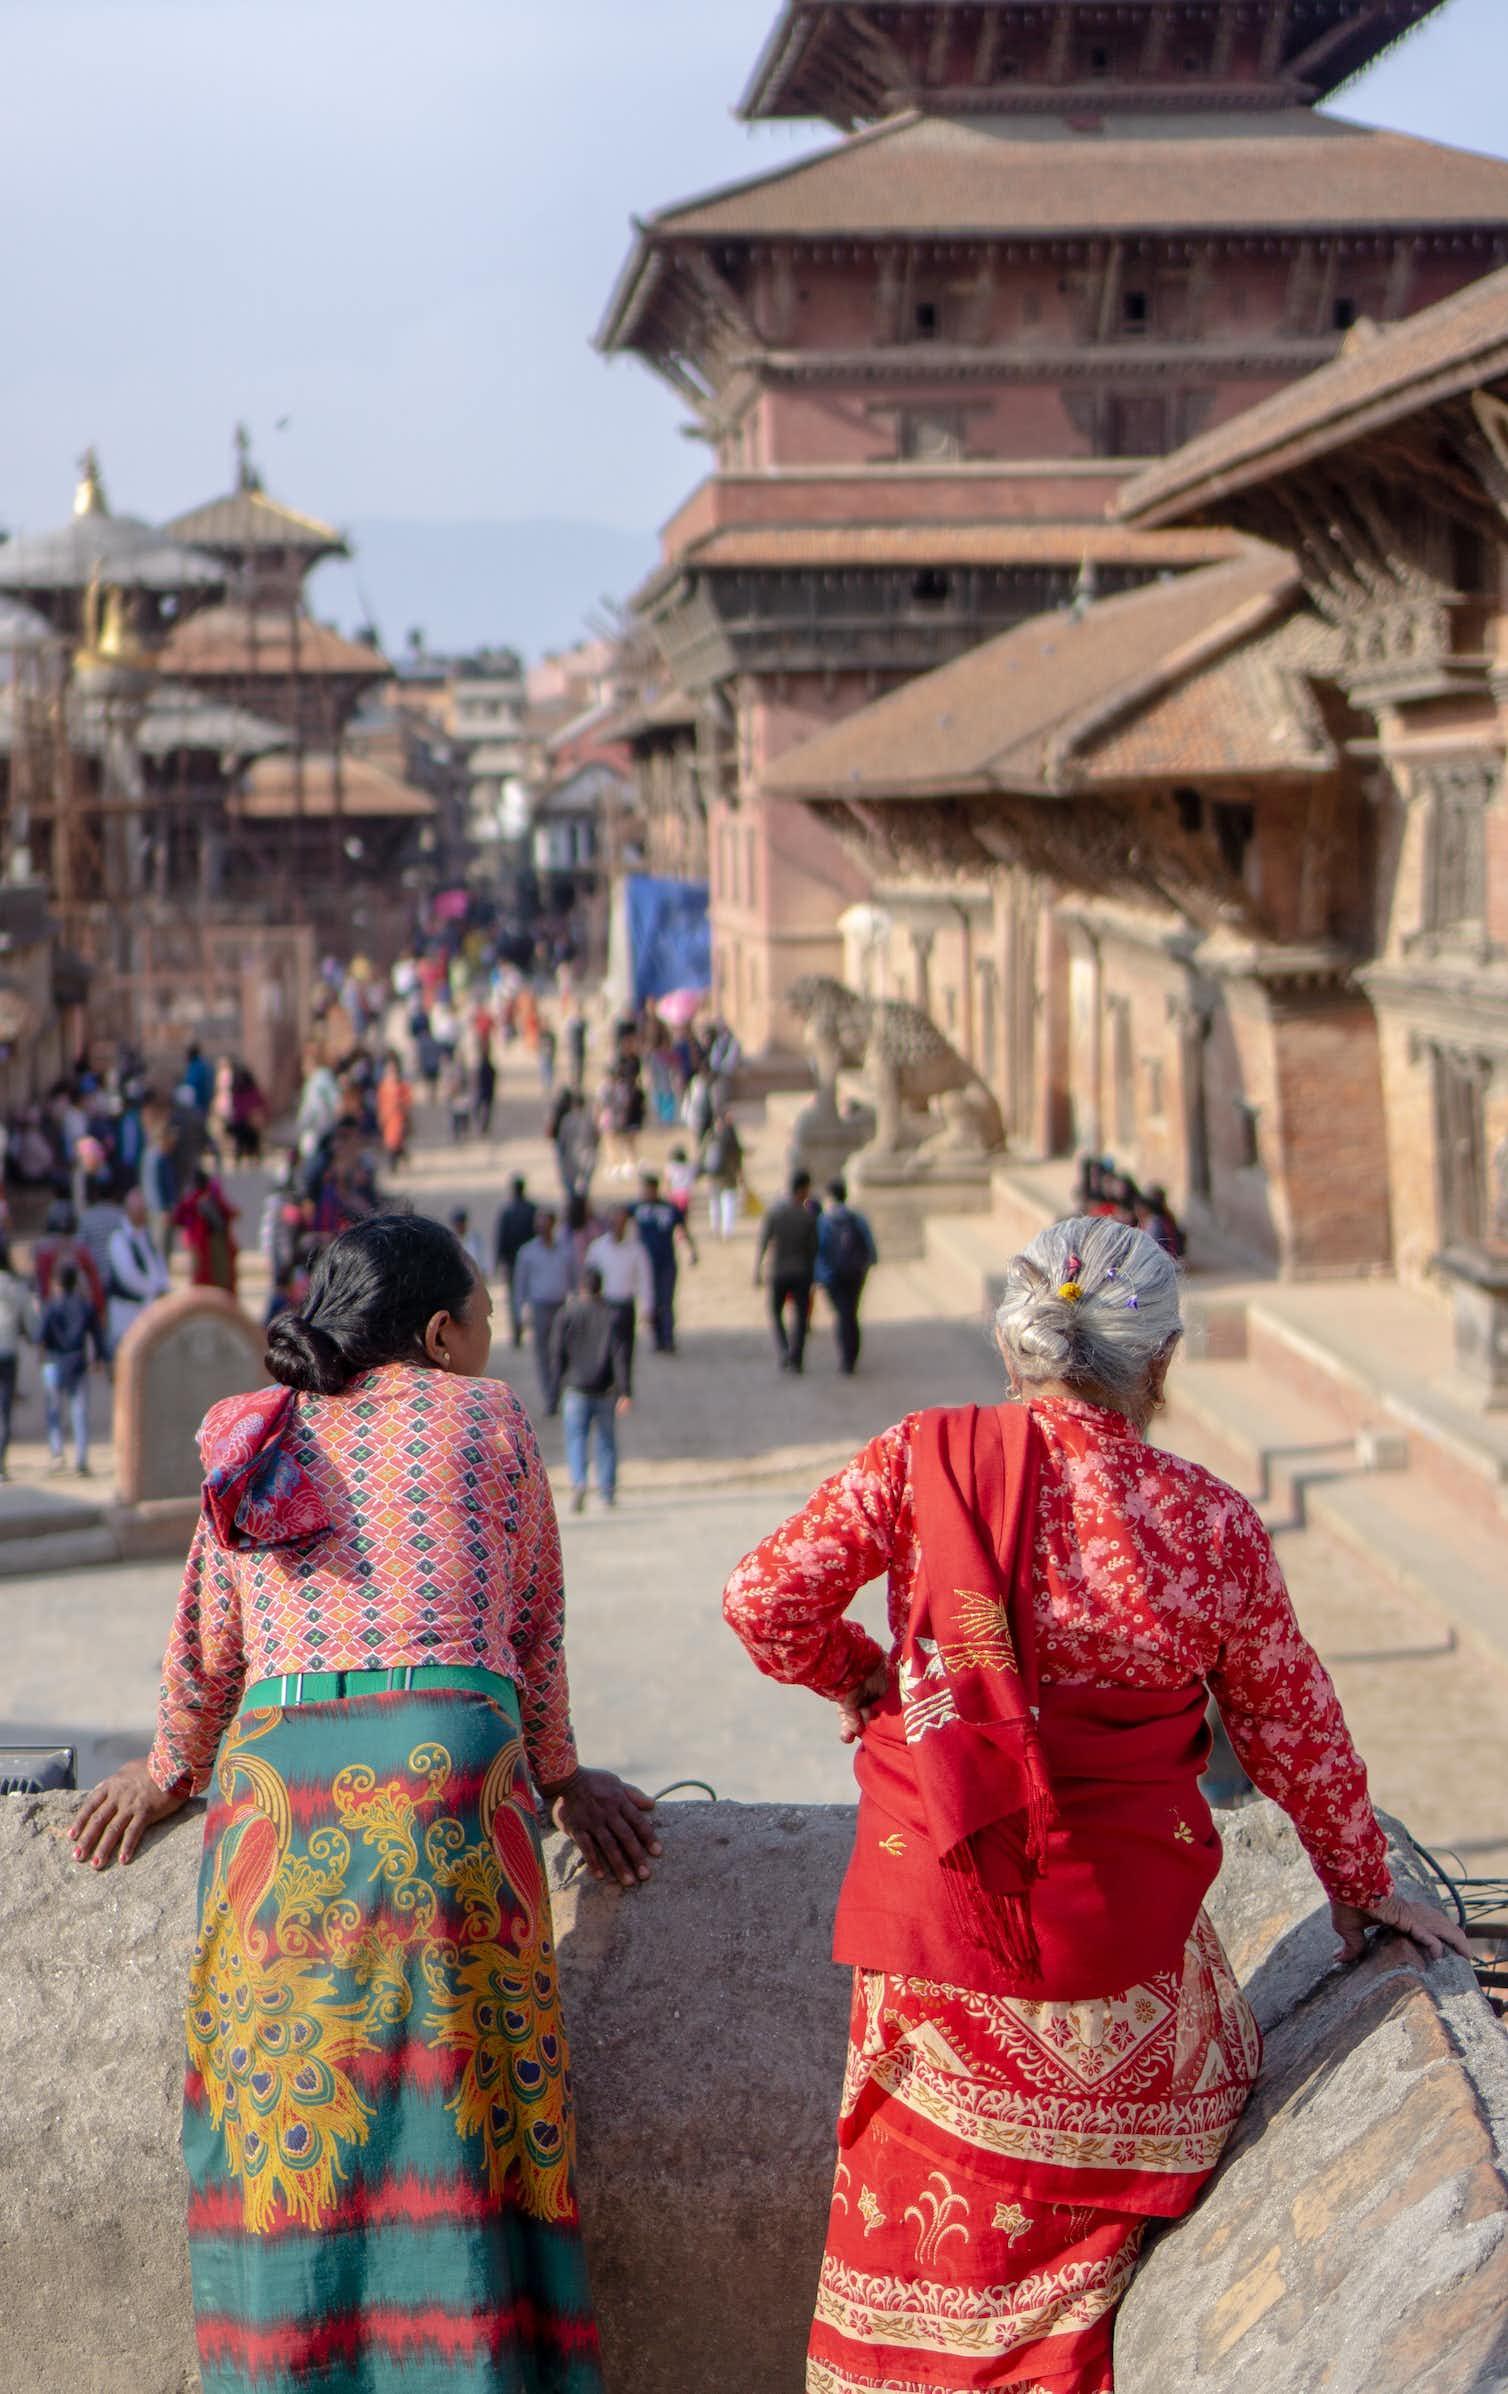 Faith shapes the city of Kathmandu. Photo credit: Michael Romanov